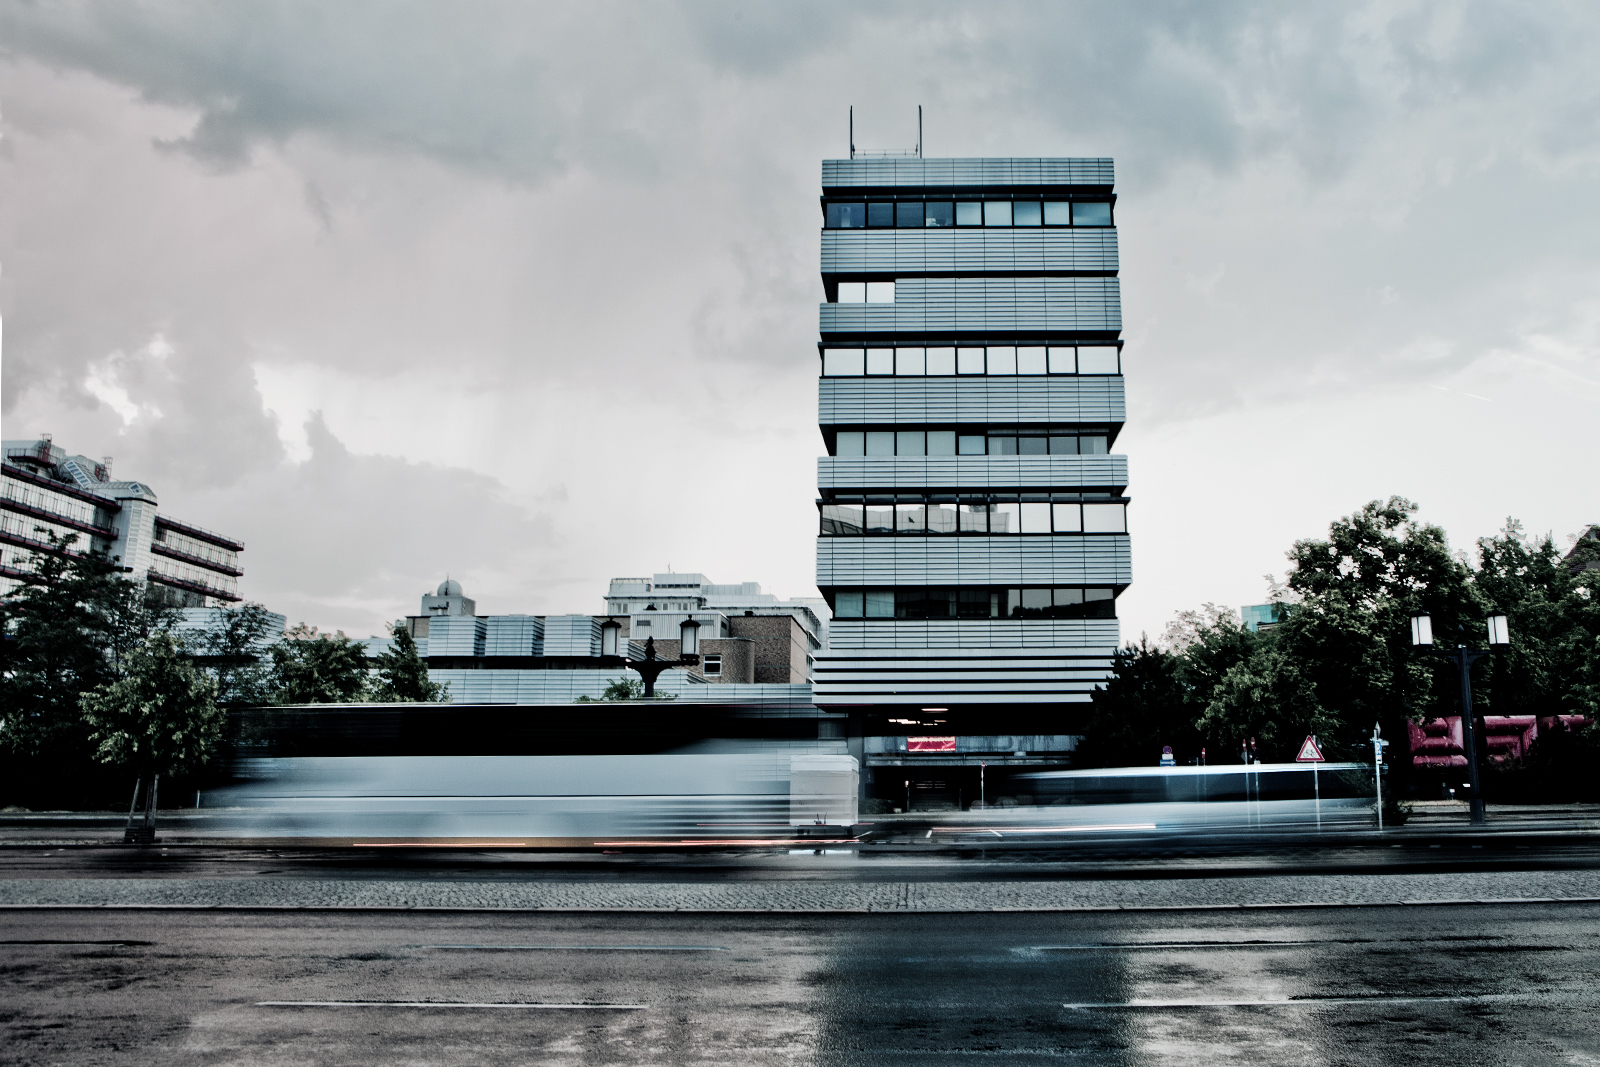 berlin_0018_Color Film - Fuji FP-100C